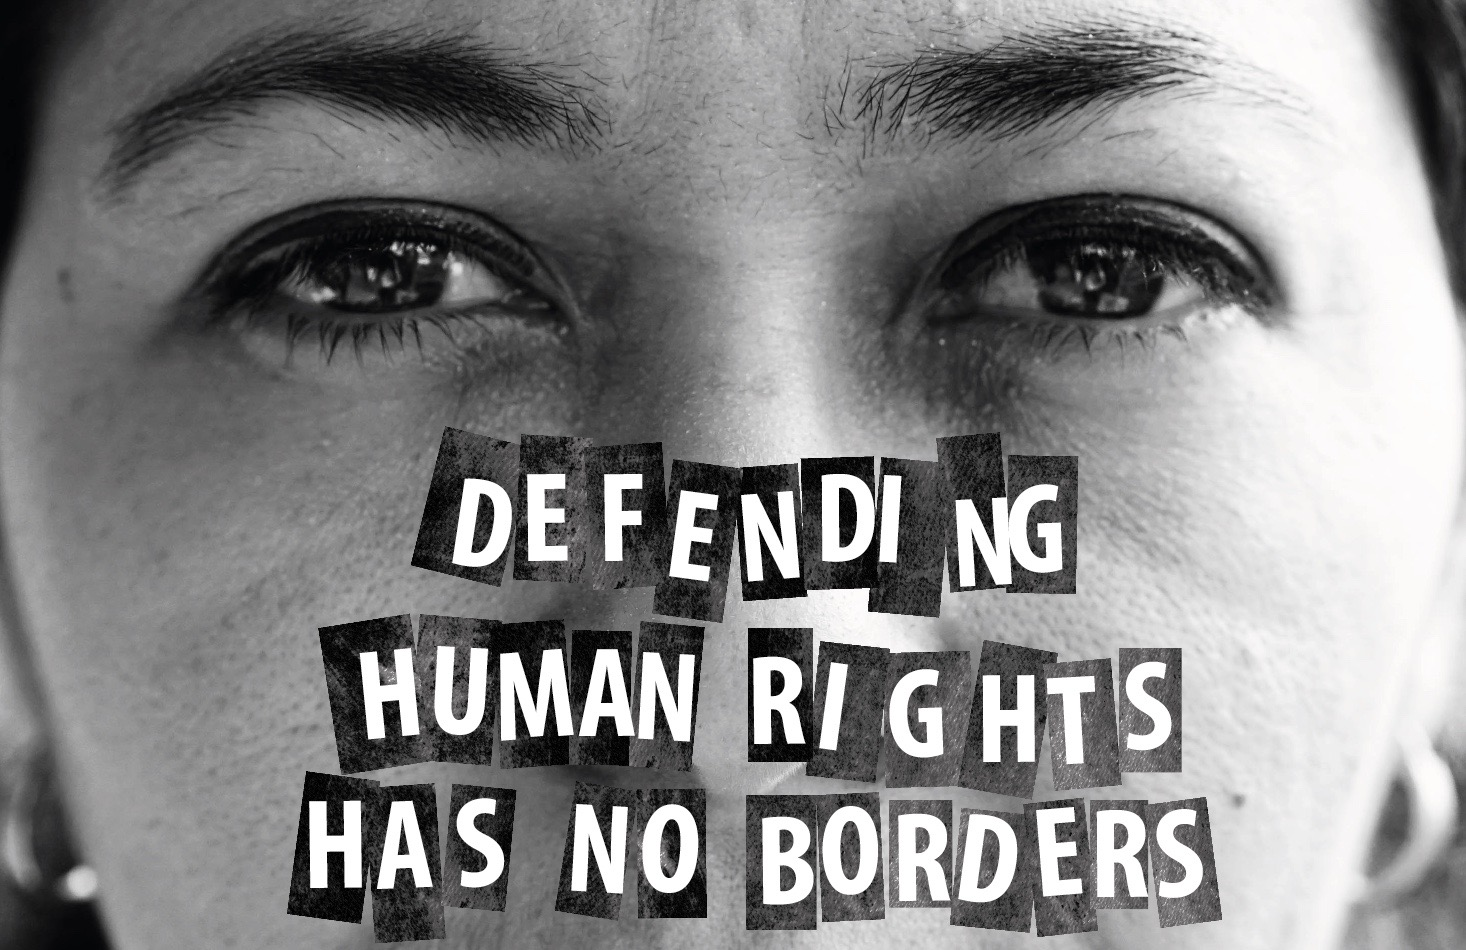 Defending Human Rights has no Borders